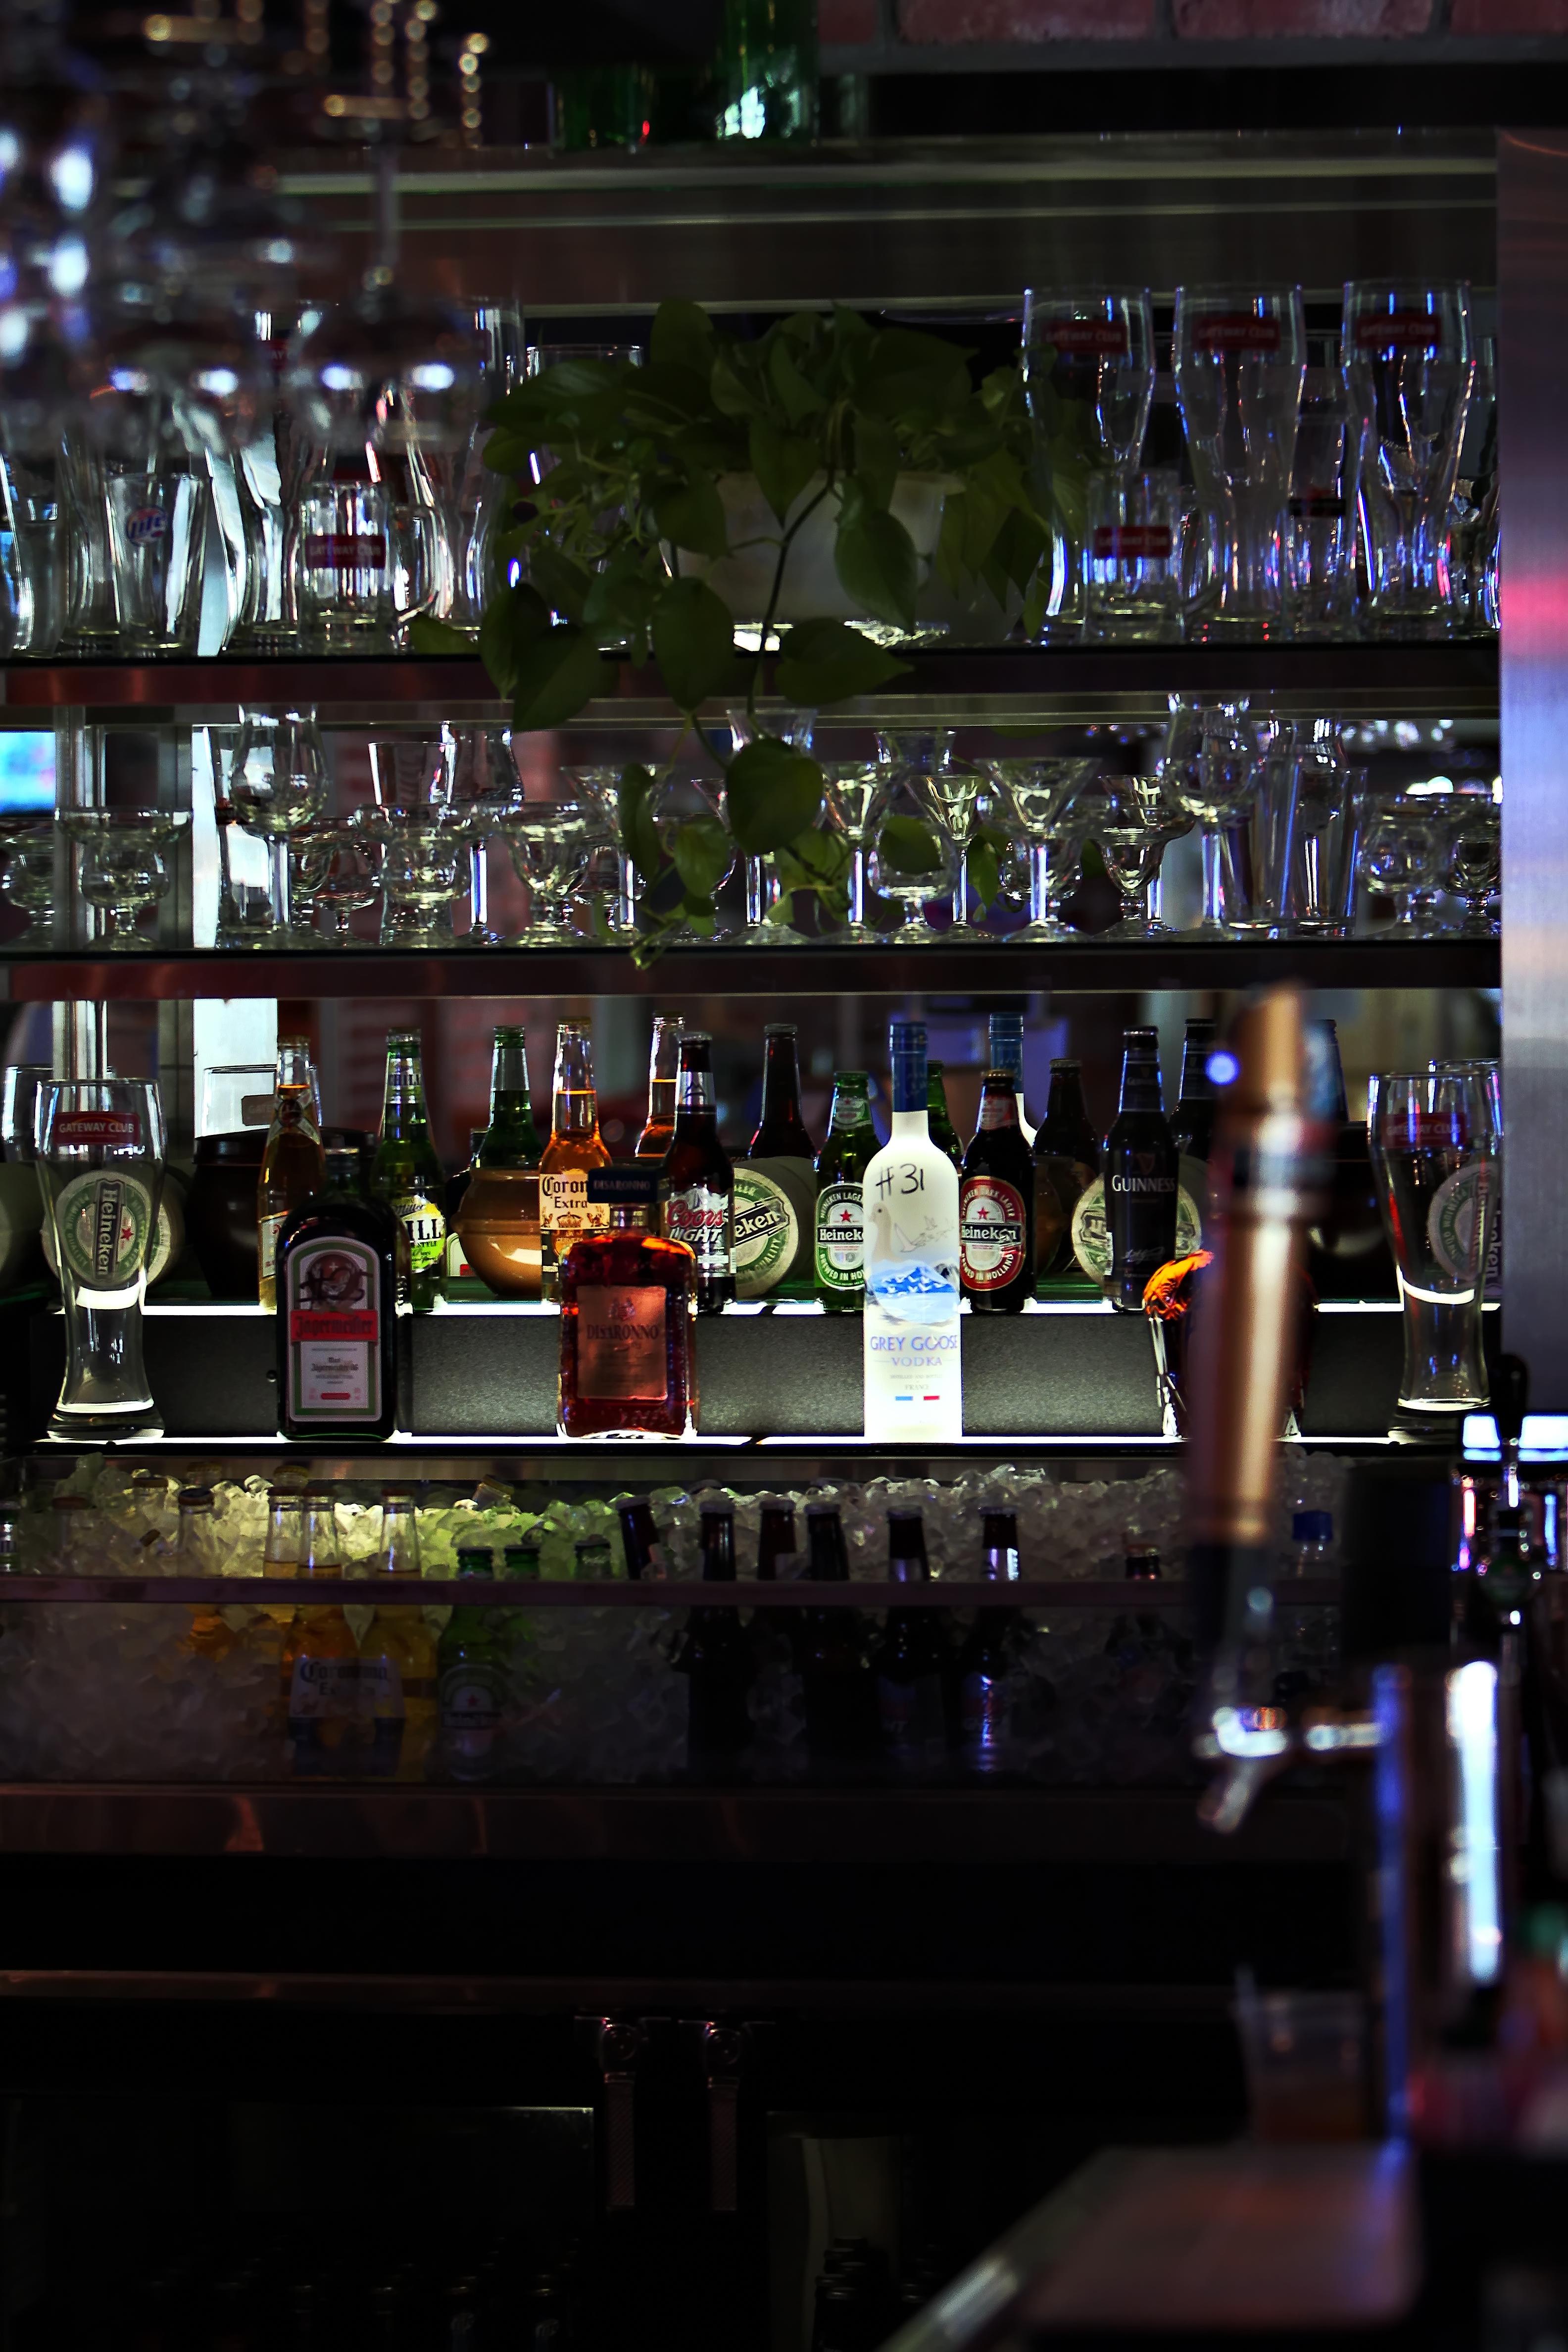 Open Bar, Alcohol, Bar, Beer, Glasses, HQ Photo